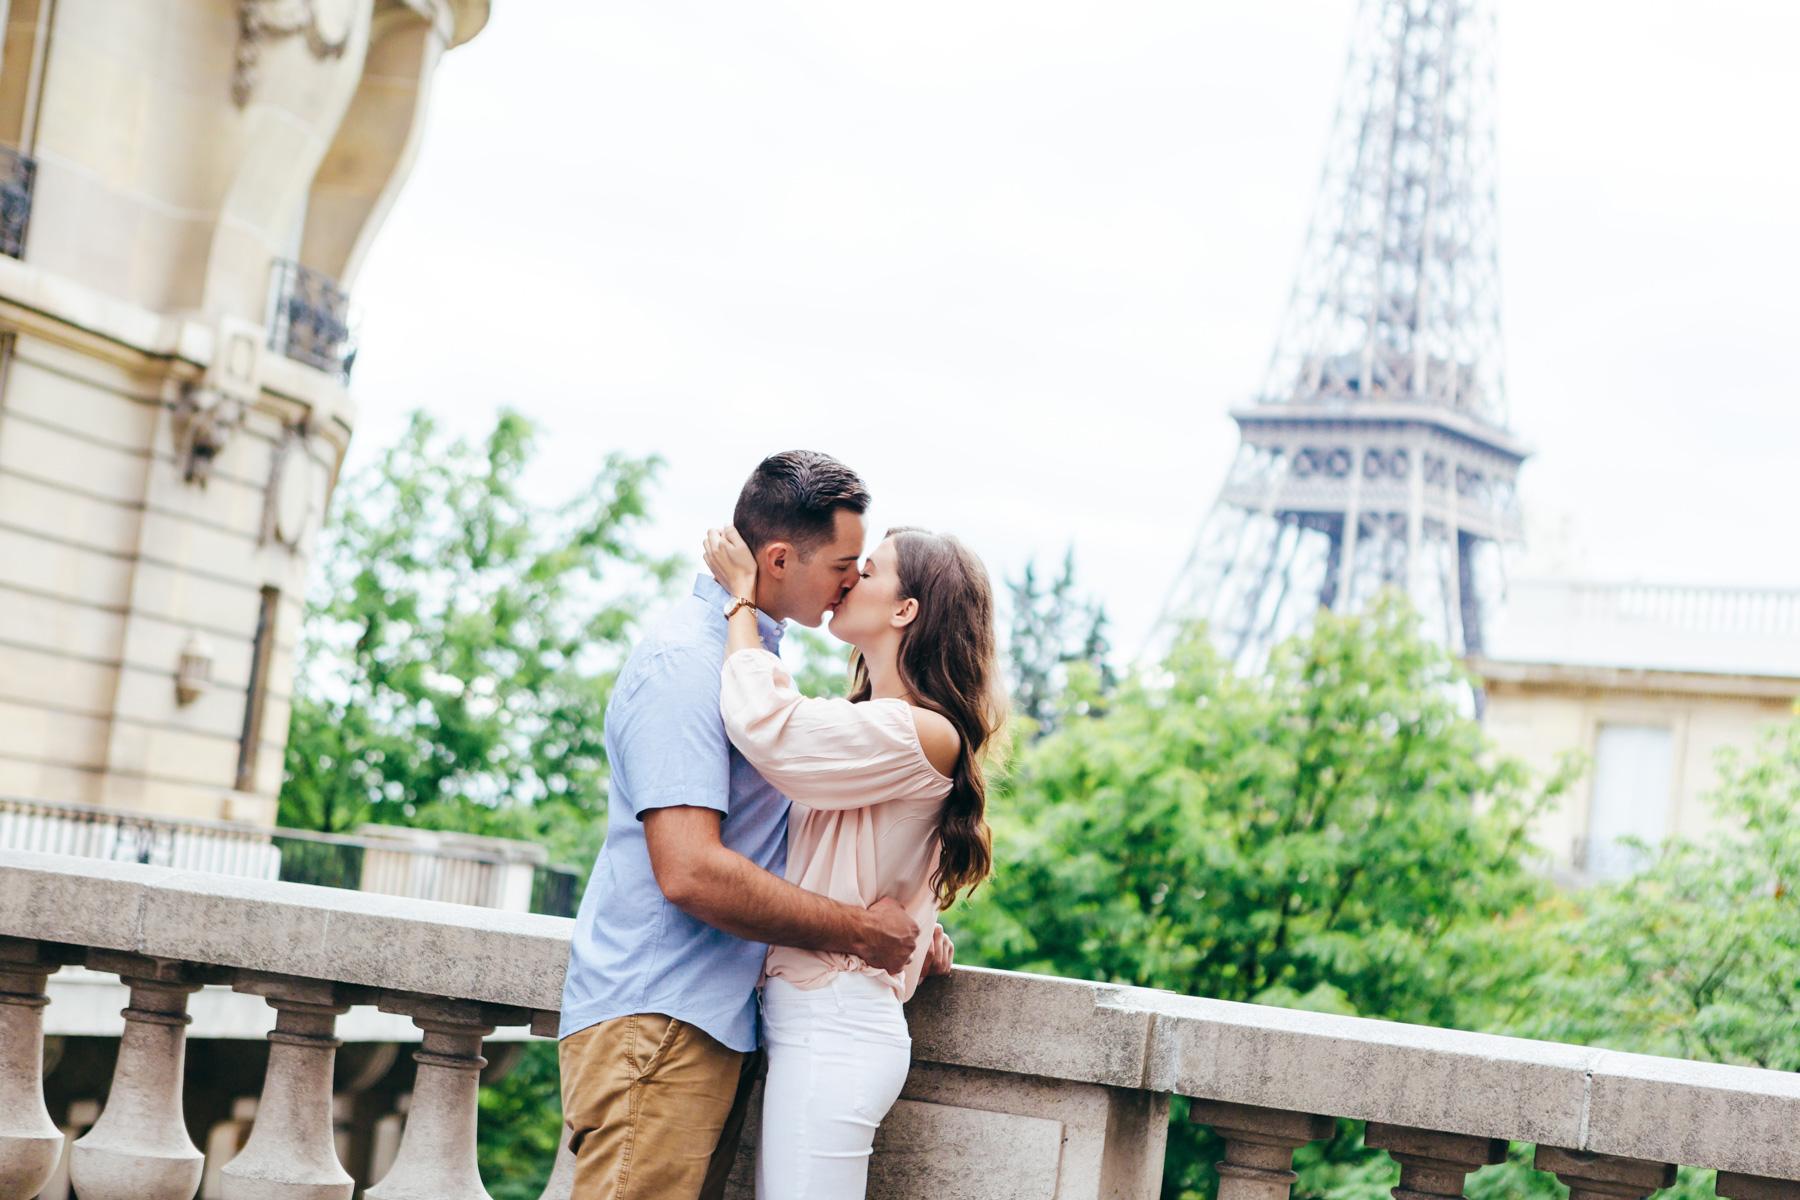 Paris Photographer Couple Photoshoot Eiffel Tower iheartparisfr